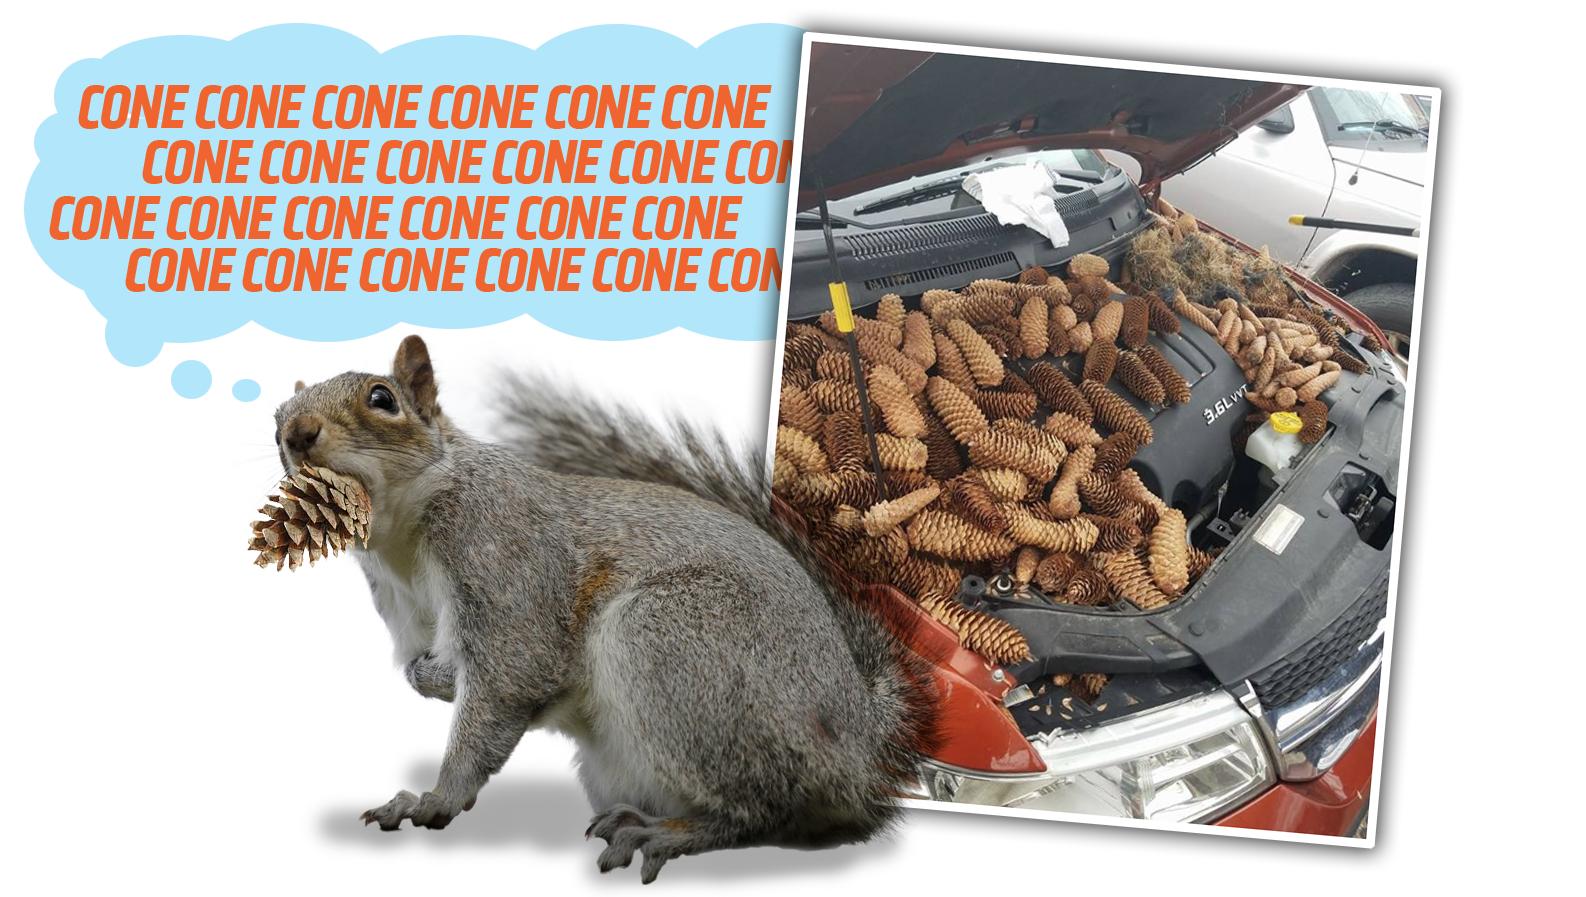 Pine Cone Junkie Squirrel Shoves 23kg Of Pine Cones Into Car's Engine Bay